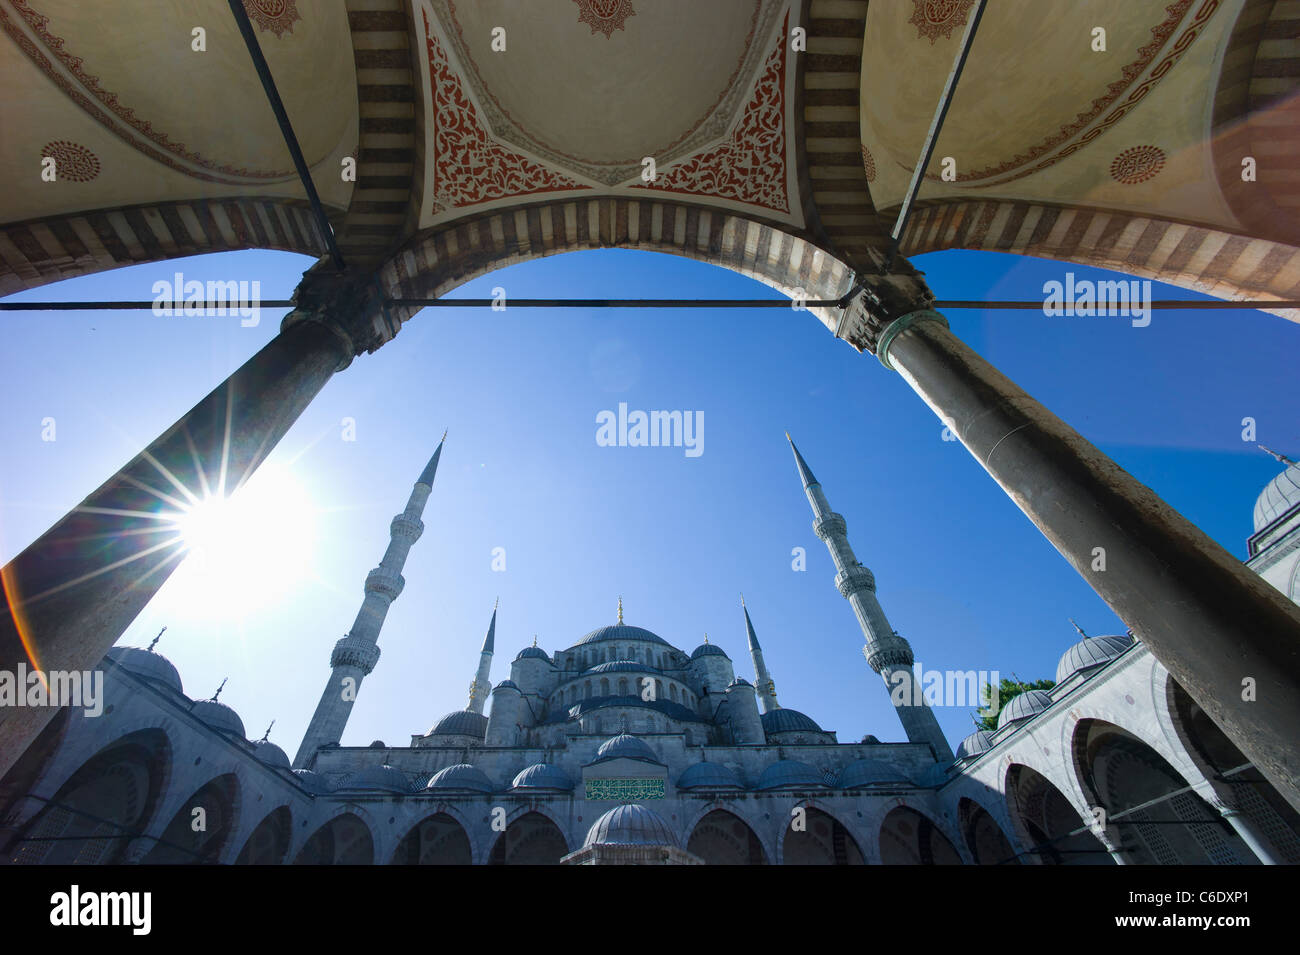 Turquía, Estambul, la Mezquita Azul Foto de stock